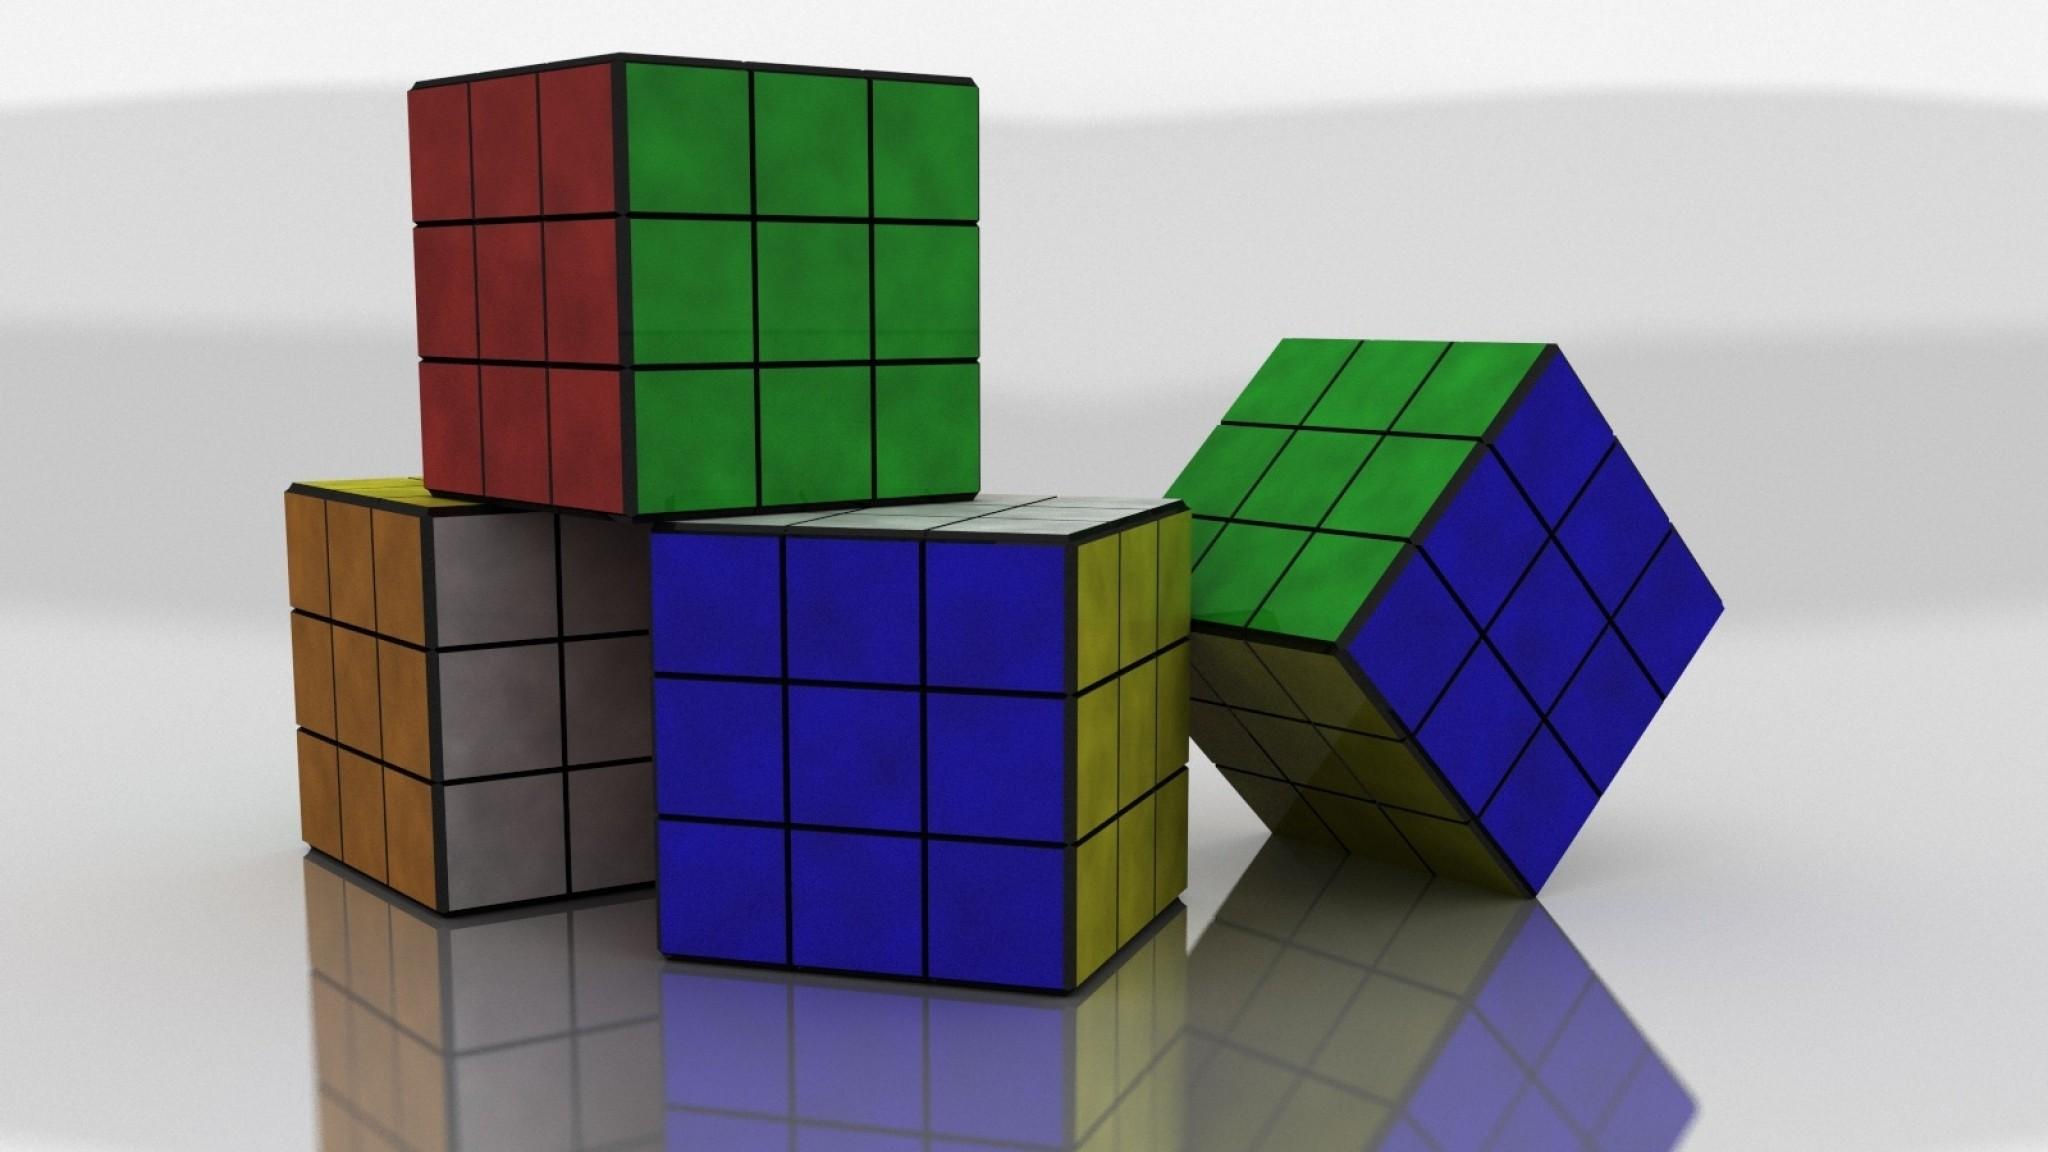 Wallpaper rubiks cube, colorful, size, shape